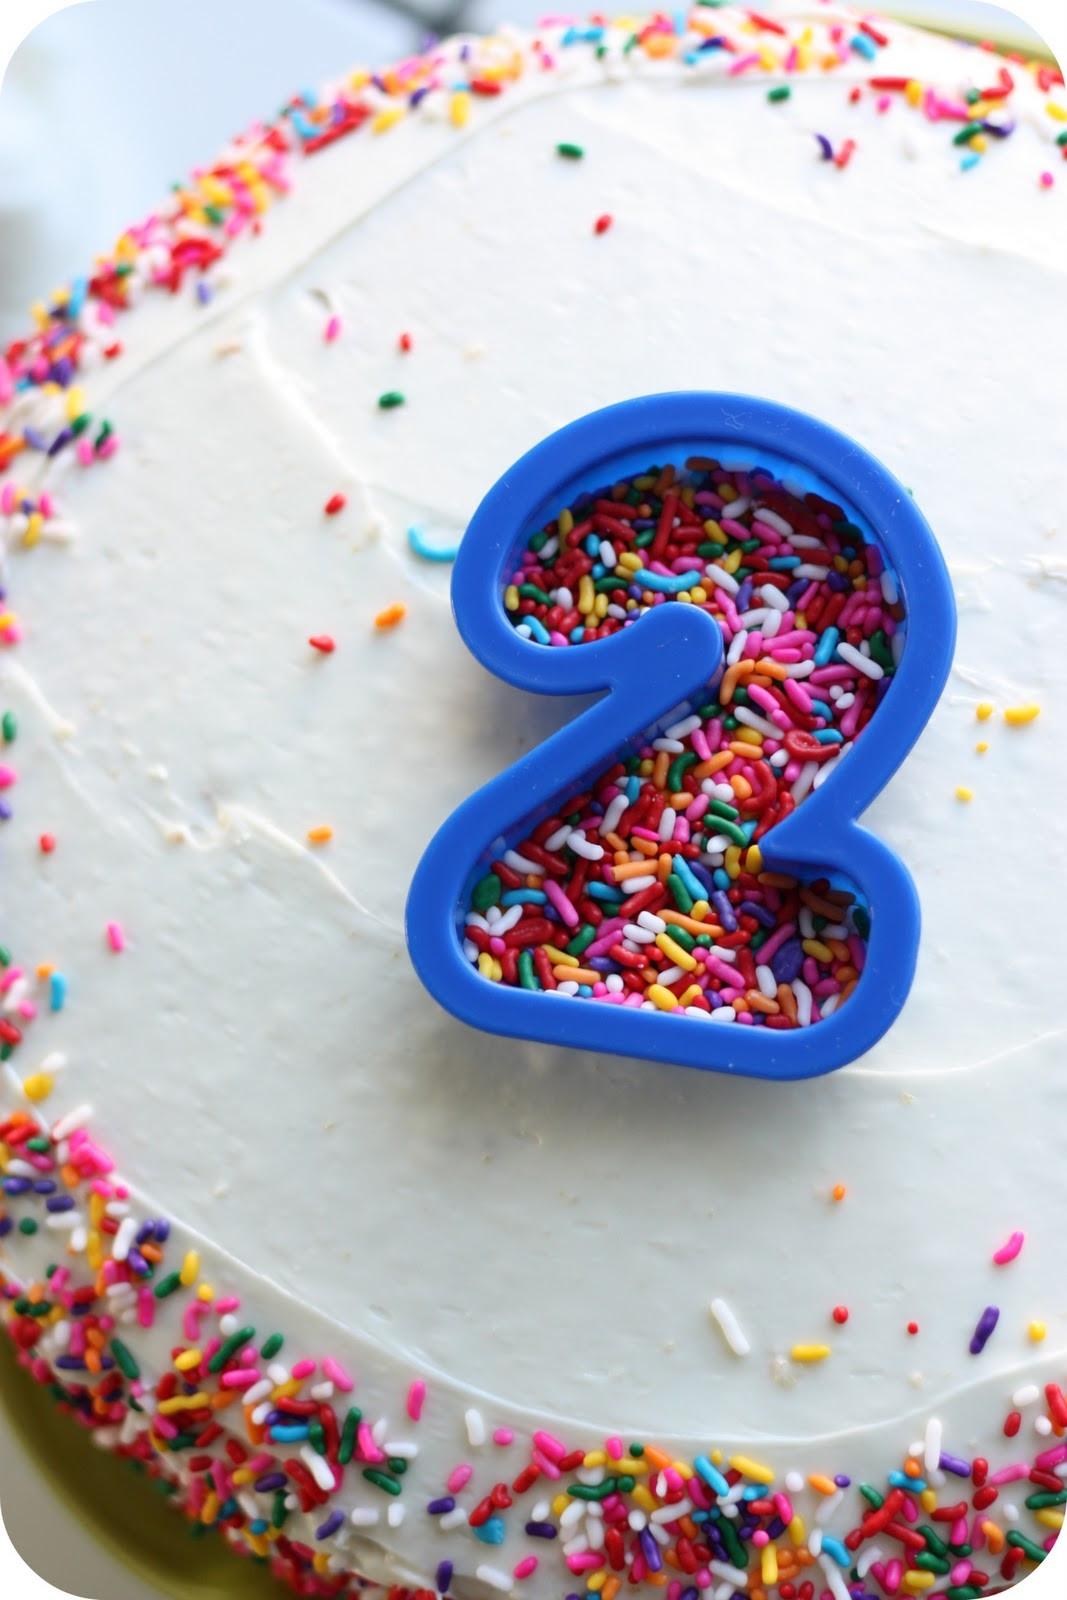 Cake Decorating Ideas For Birthday  20 Birthday Cake Decoration Ideas